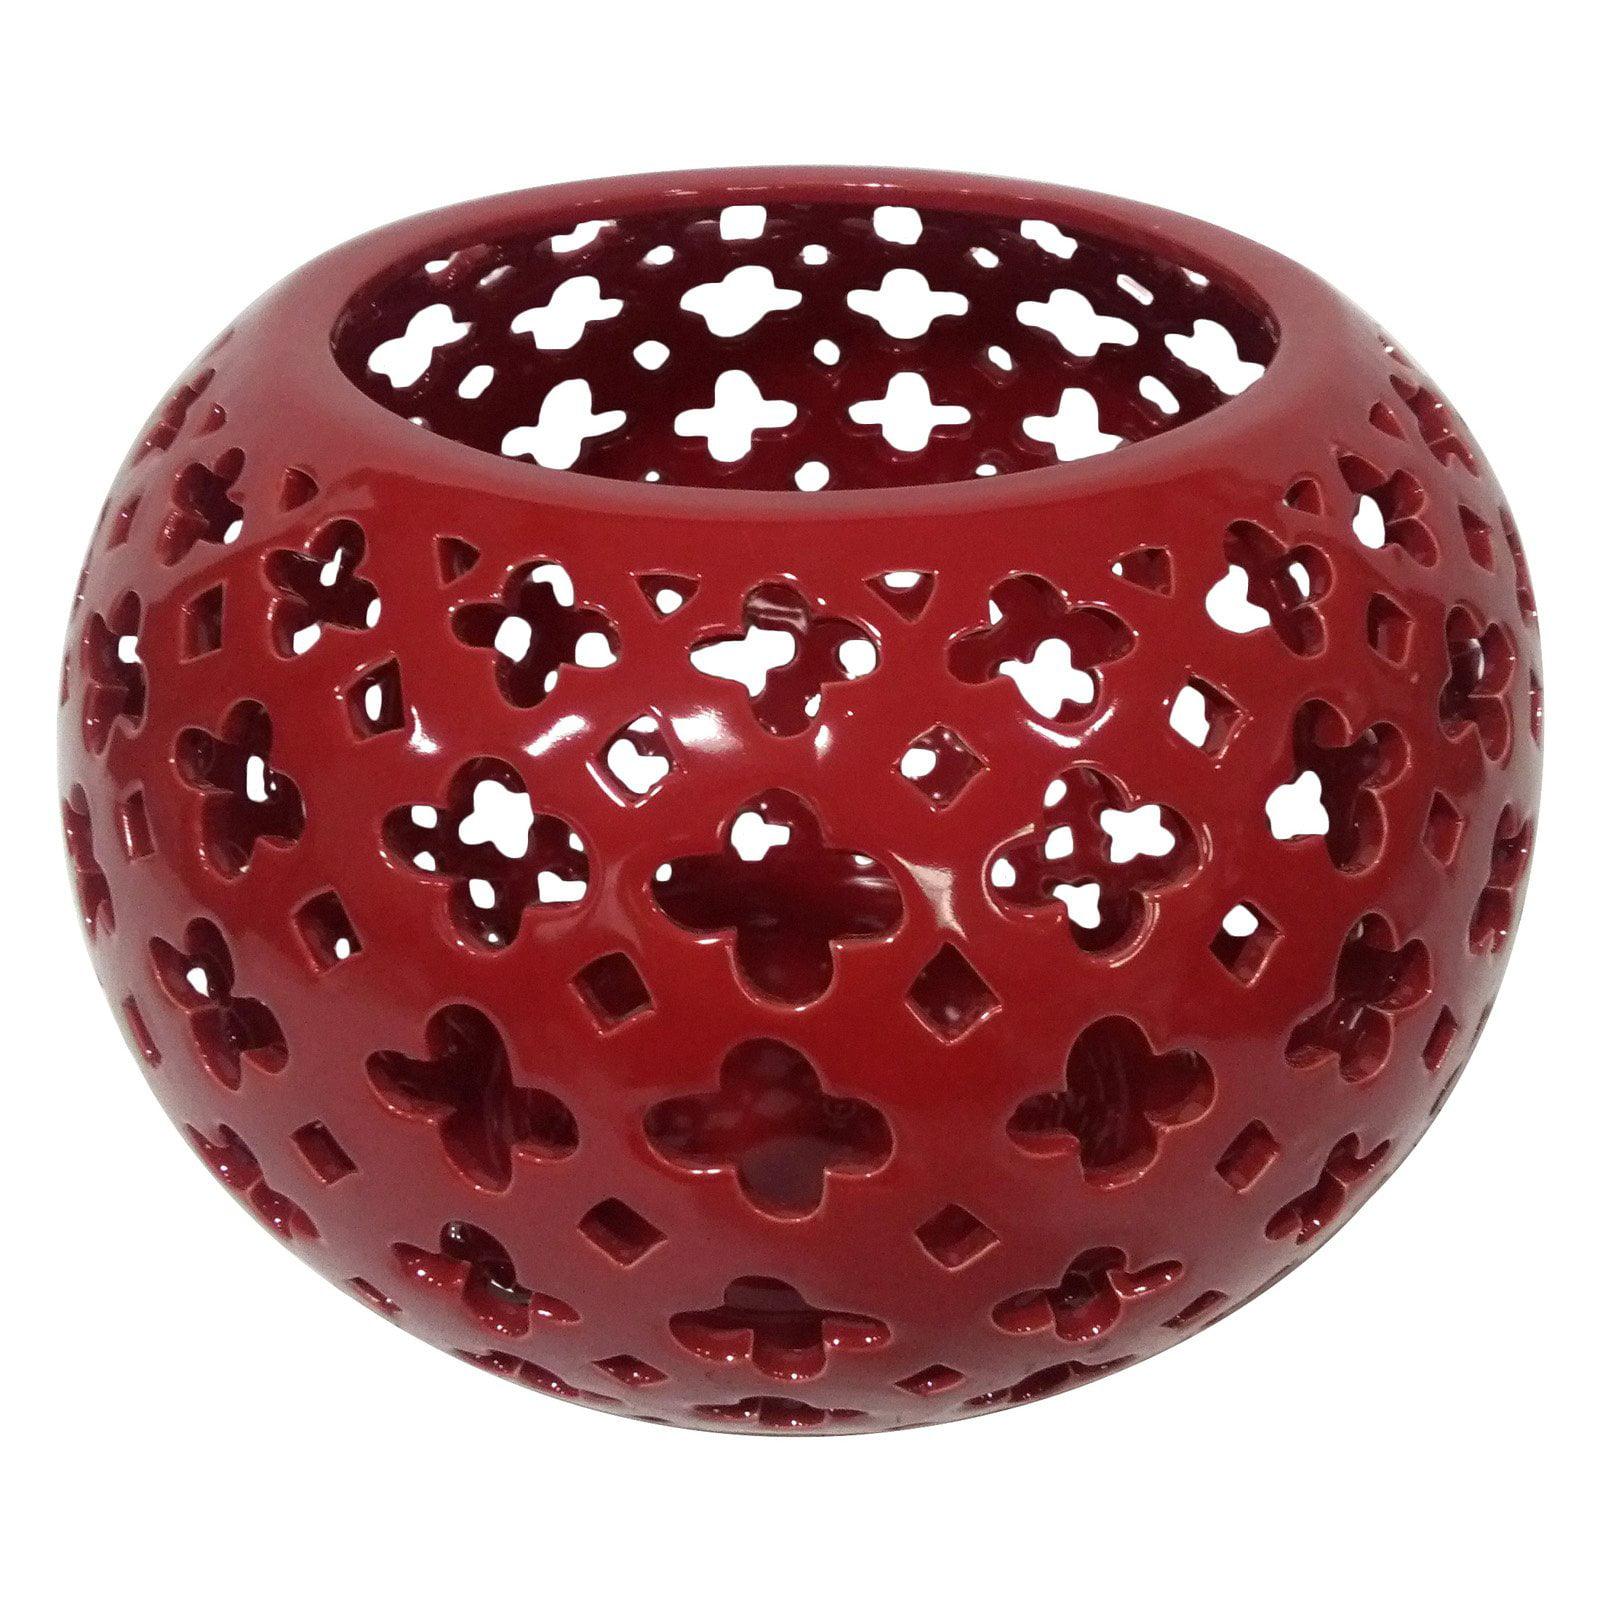 Three Hands Pierced Silver Ceramic Globe Bowl